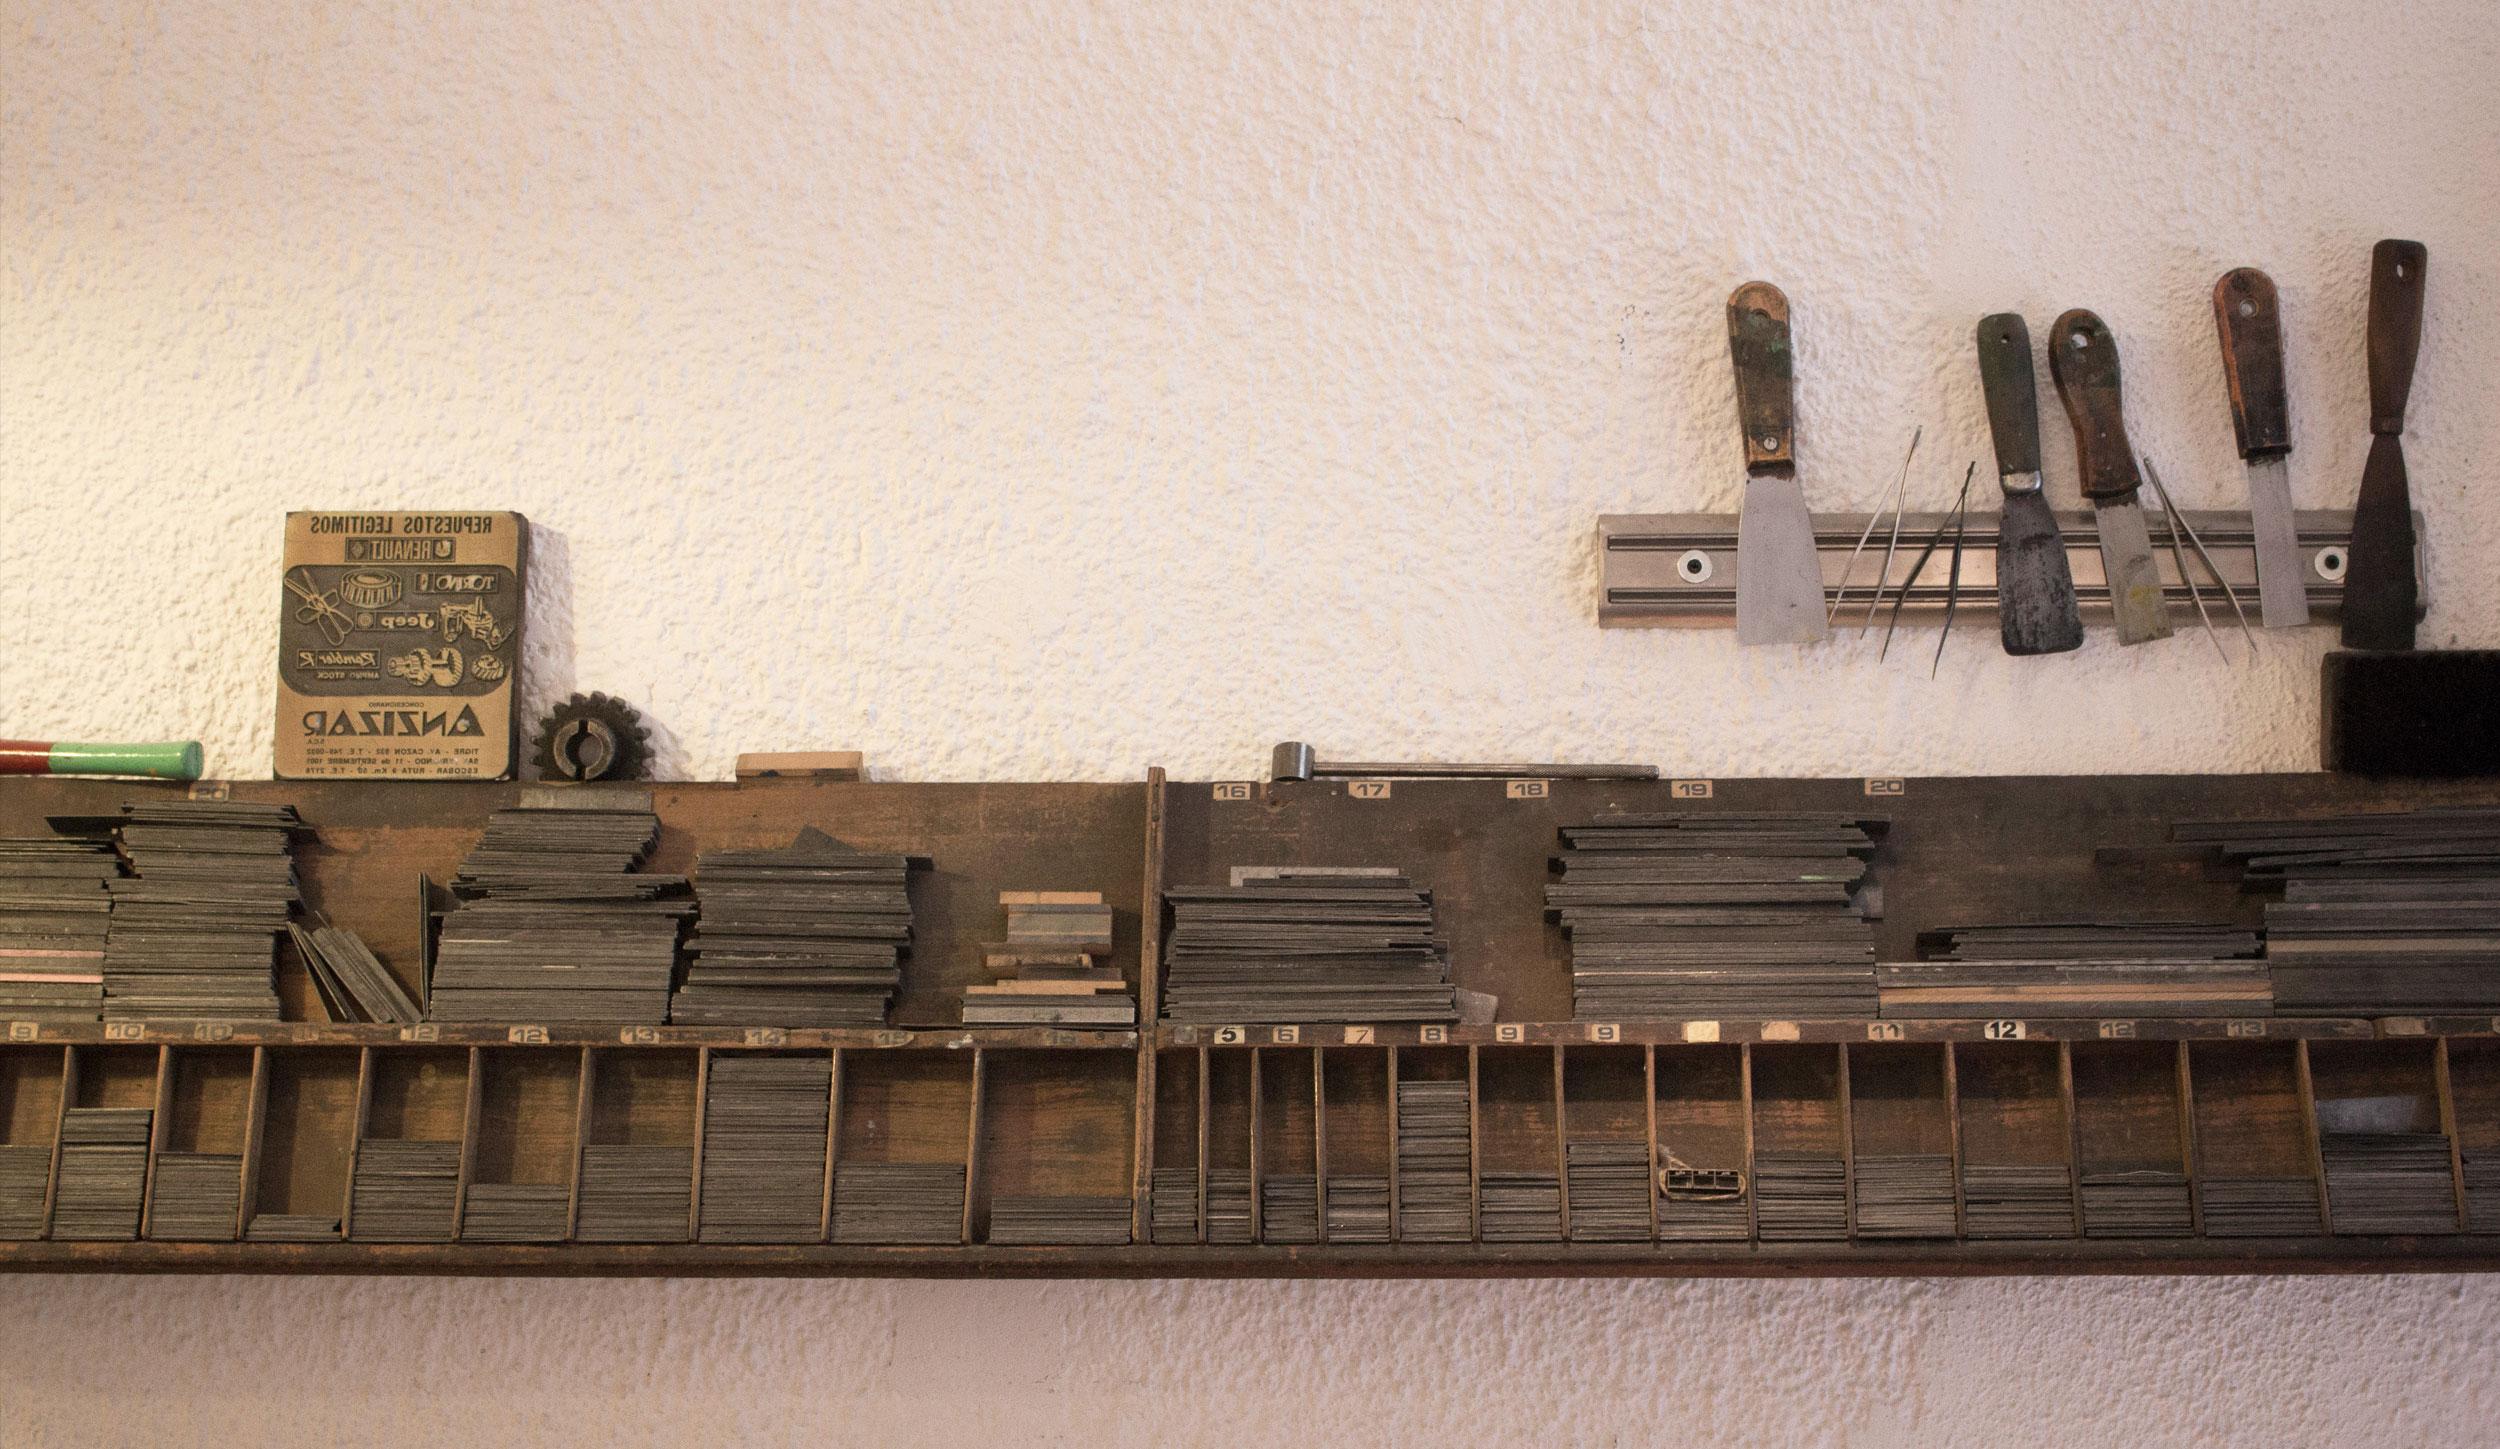 1-home-papel-principal-letterpress-imprenta-tipografica-artesanal.jpg